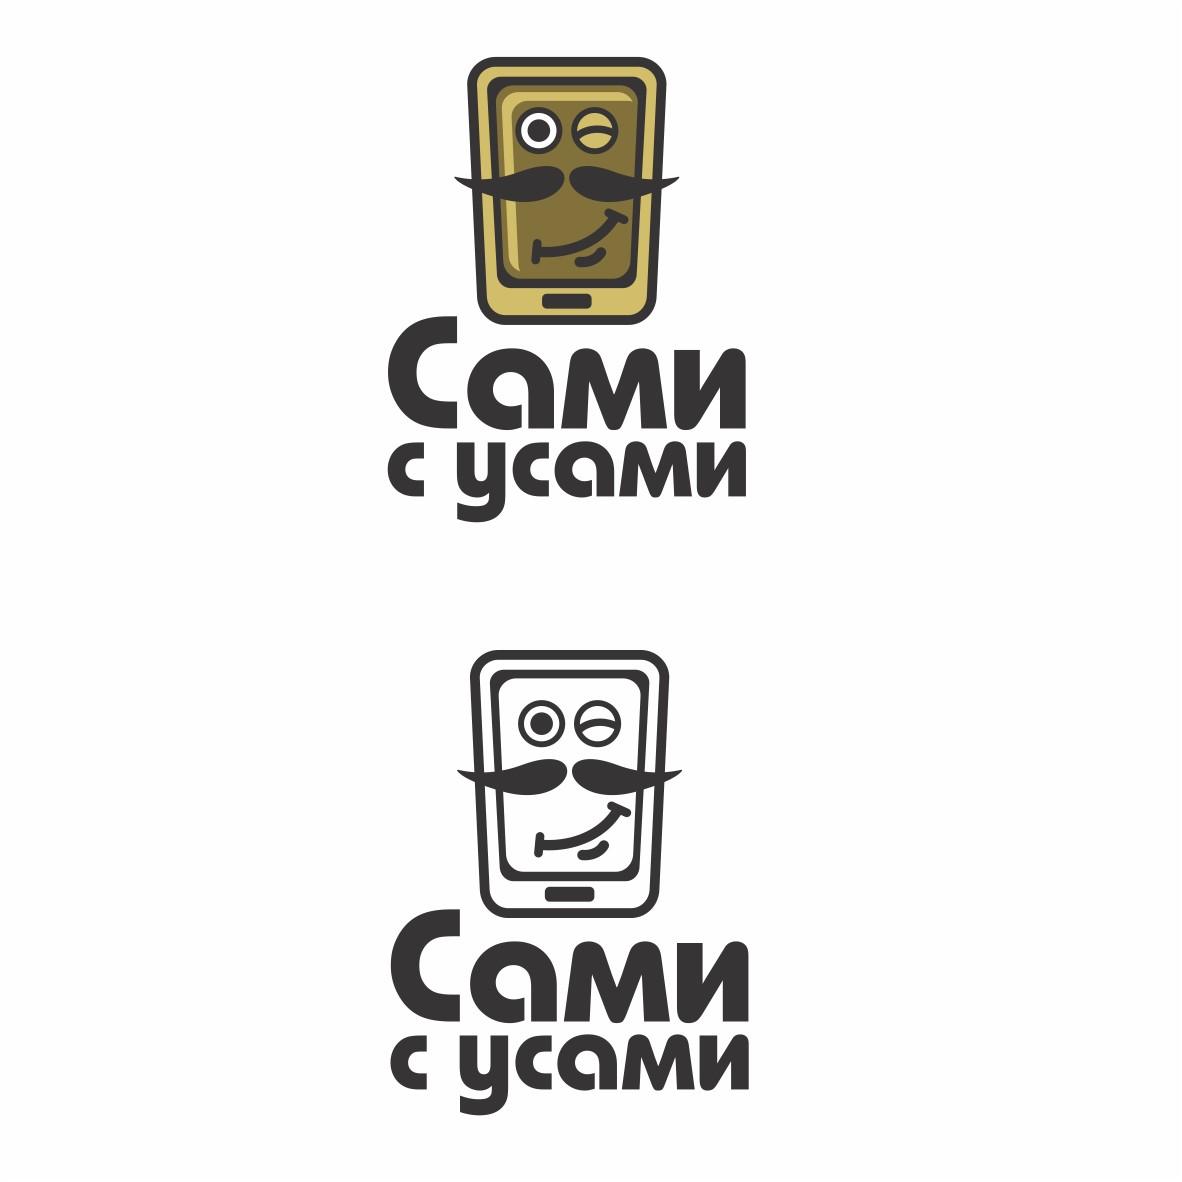 Разработка Логотипа 6 000 руб. фото f_53958f7511c96bd5.jpg